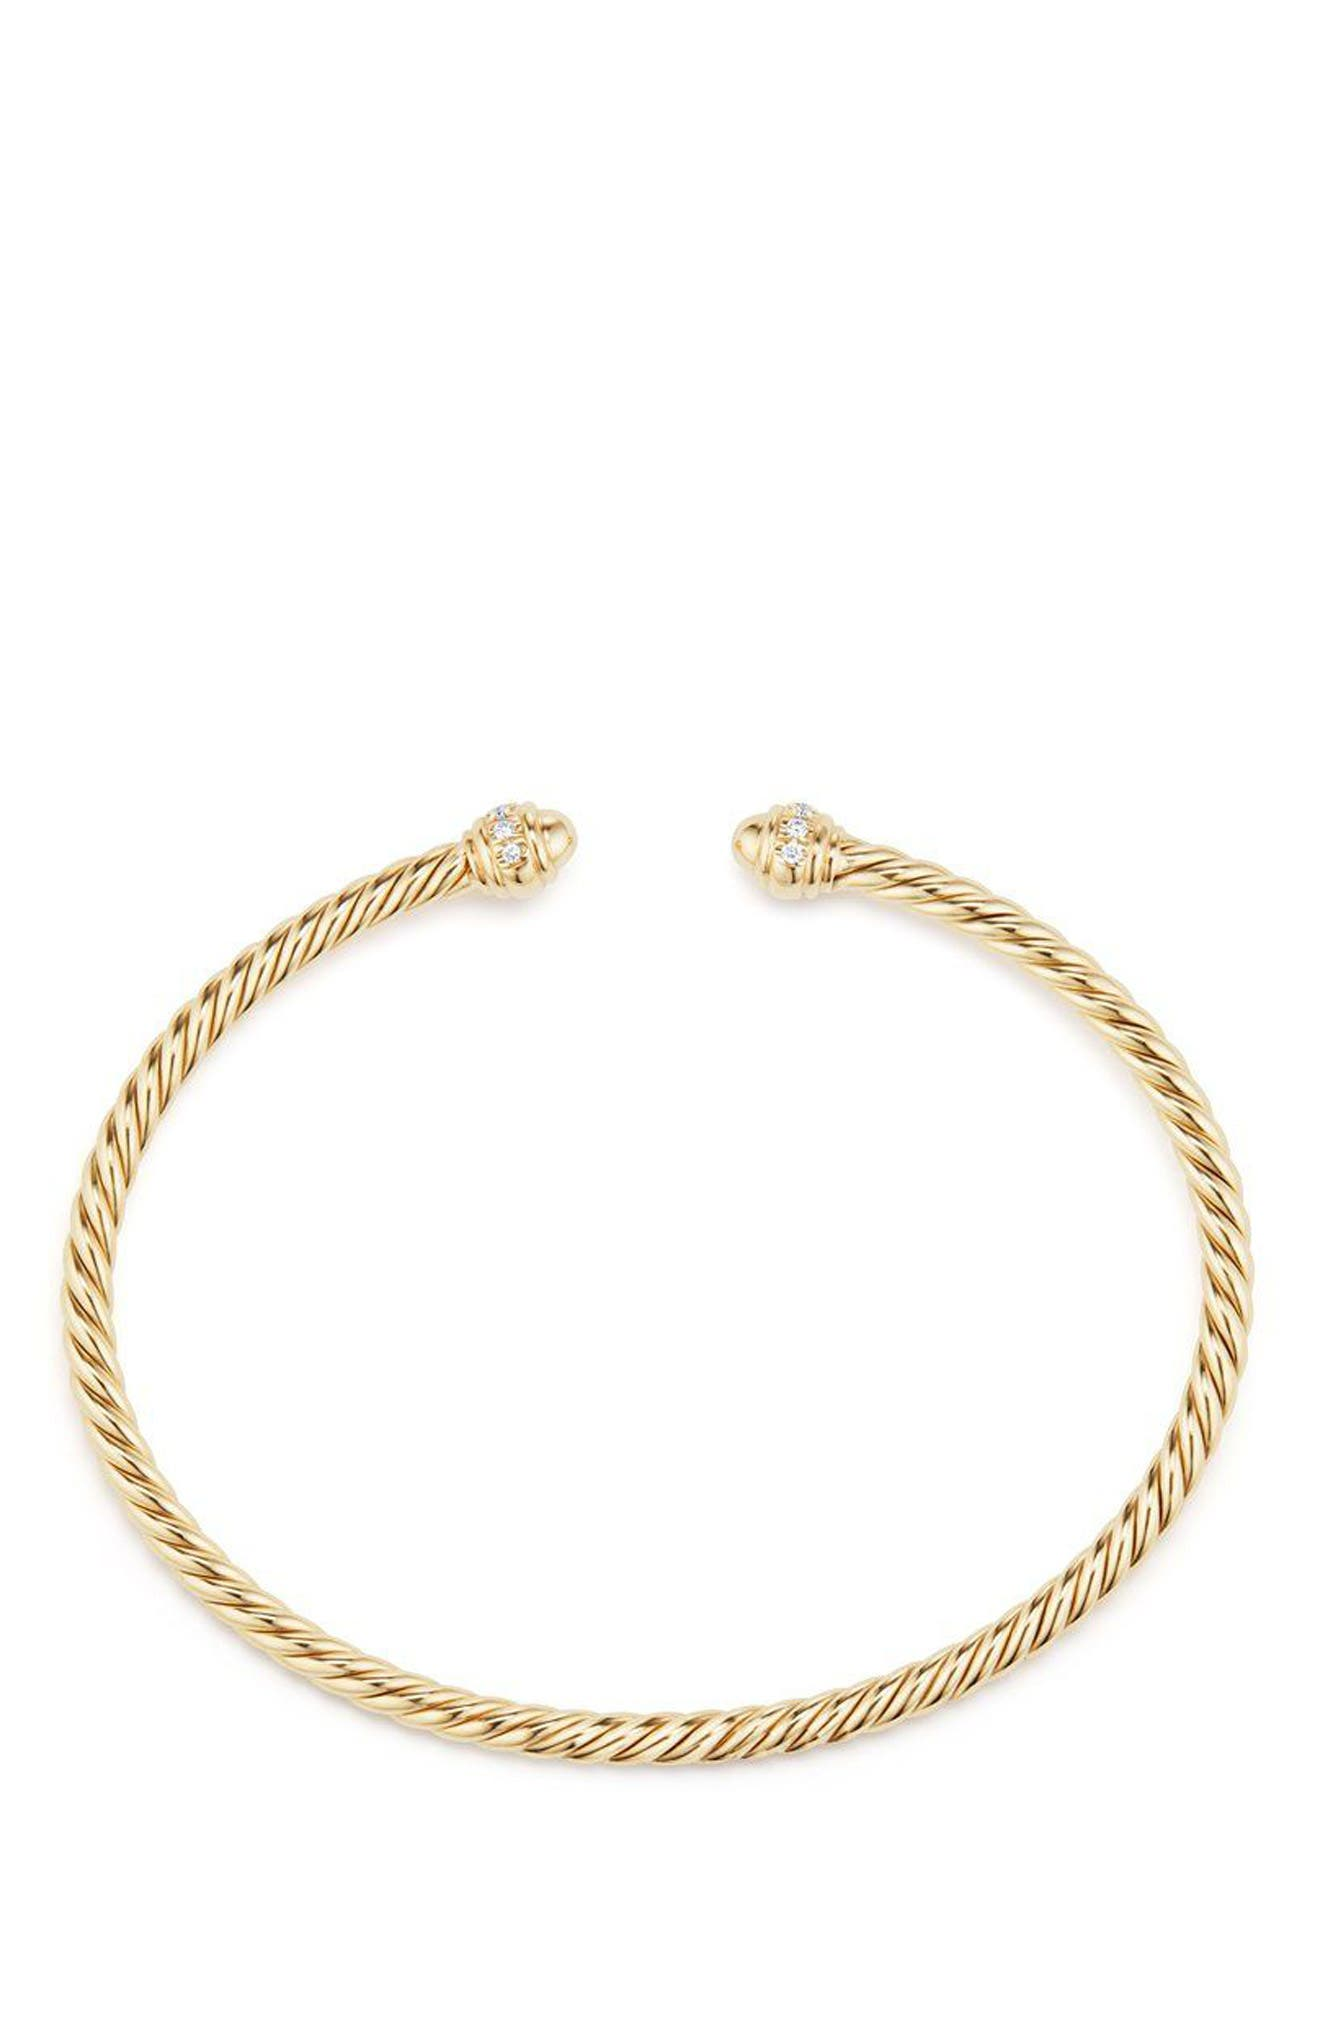 Cable Spira Bracelet in 18K Gold with Diamonds, 3mm,                             Alternate thumbnail 2, color,                             Gold/ Diamond